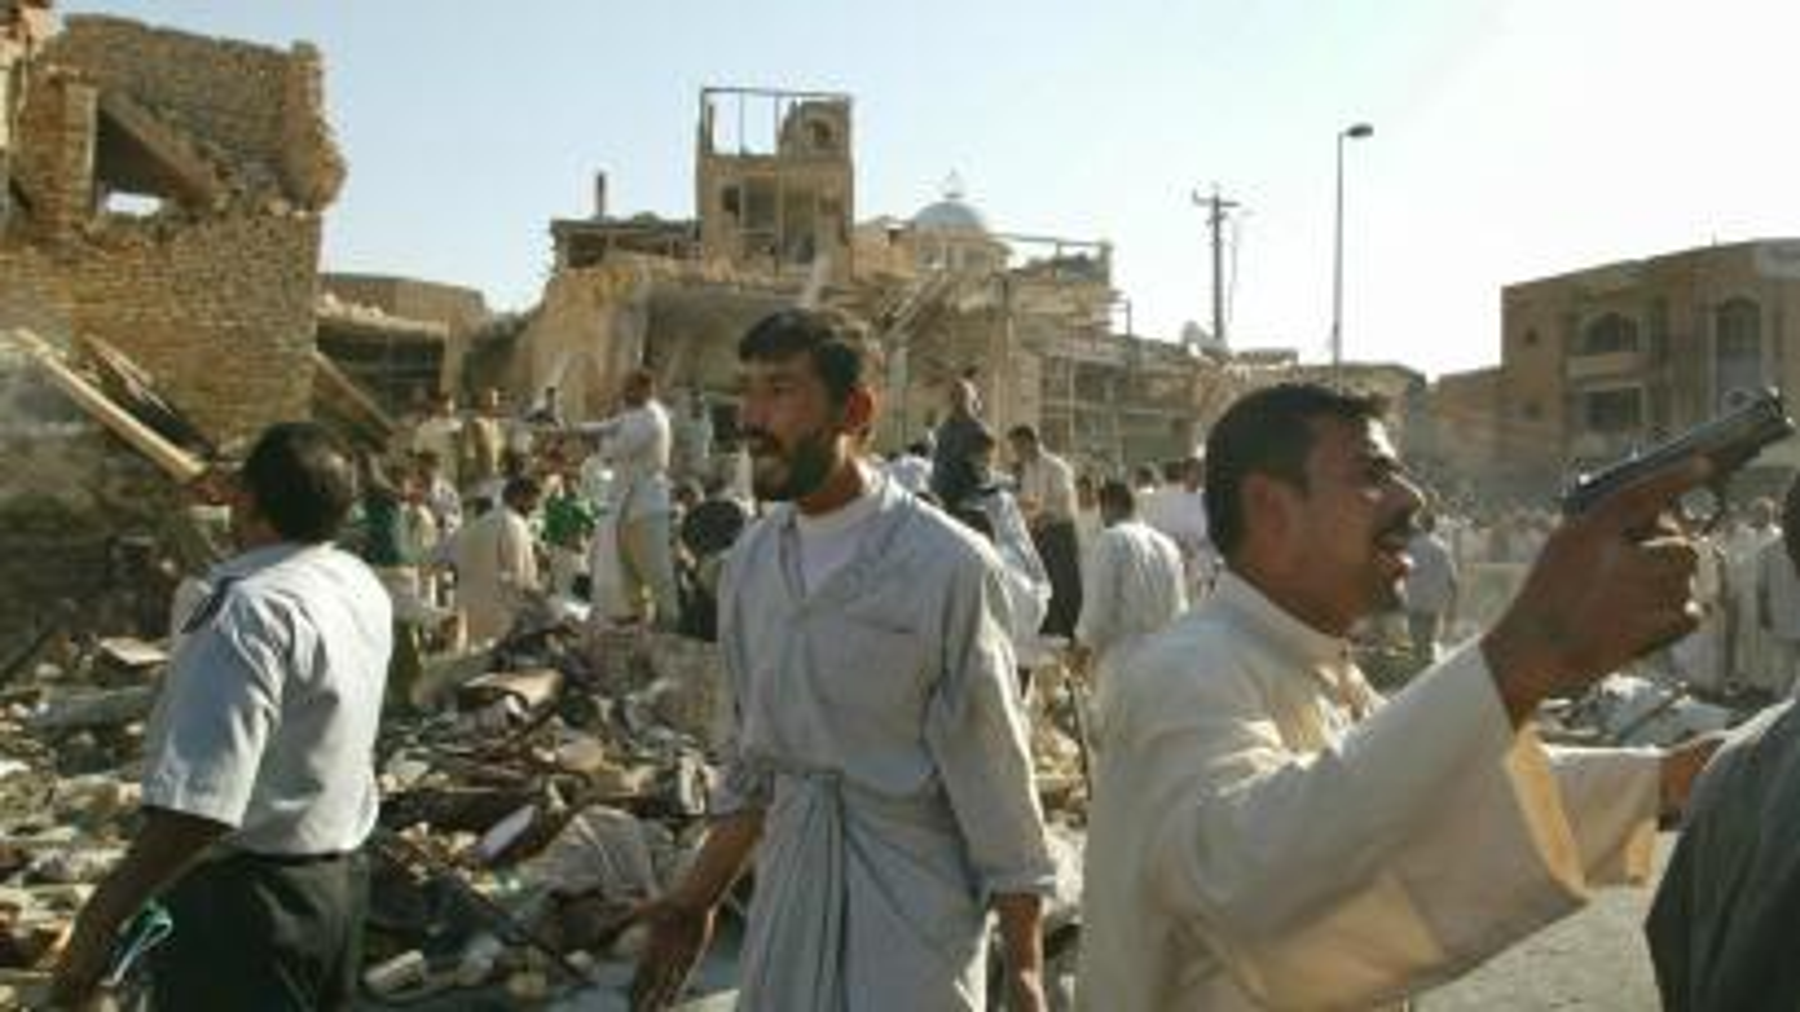 Aftermath of the Imam Ali shrine bomb blast in Najaf